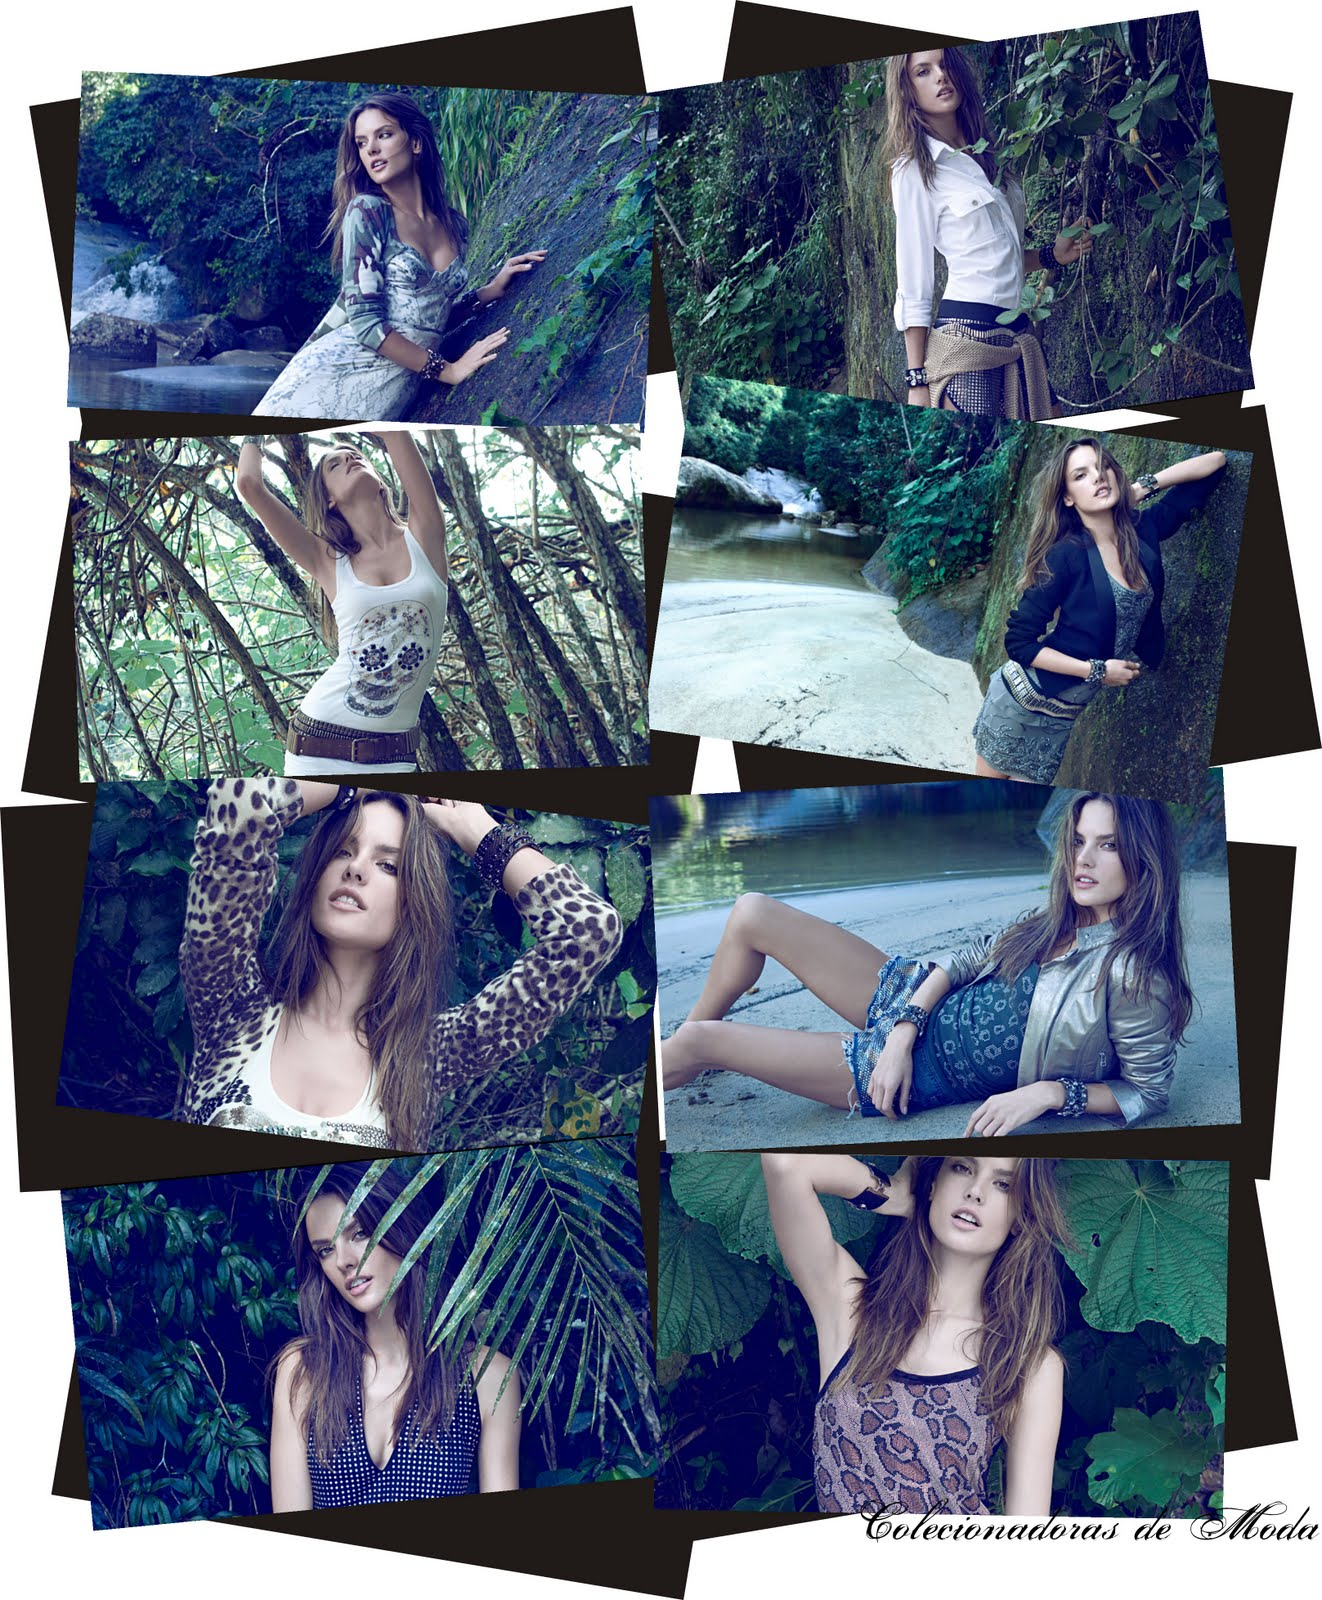 http://2.bp.blogspot.com/_1X3HRtaa2Hc/TFrX745KFII/AAAAAAAACcU/P56VPpAl2jg/s1600/catalogo+bobo+colecionadorasdmoda.jpg